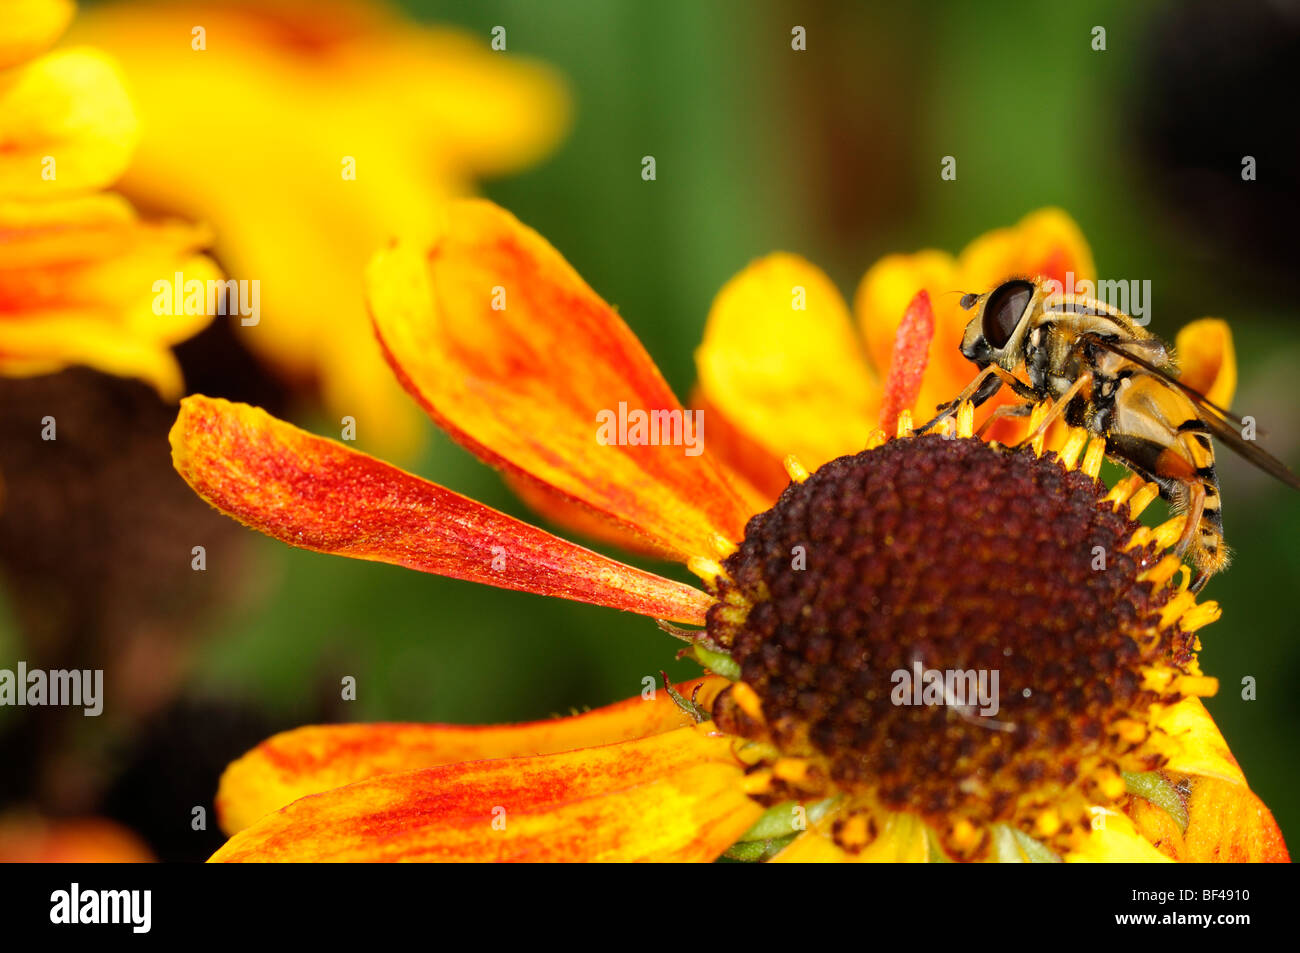 hoverfly feeding on single lone one helenium flower close up - Stock Image